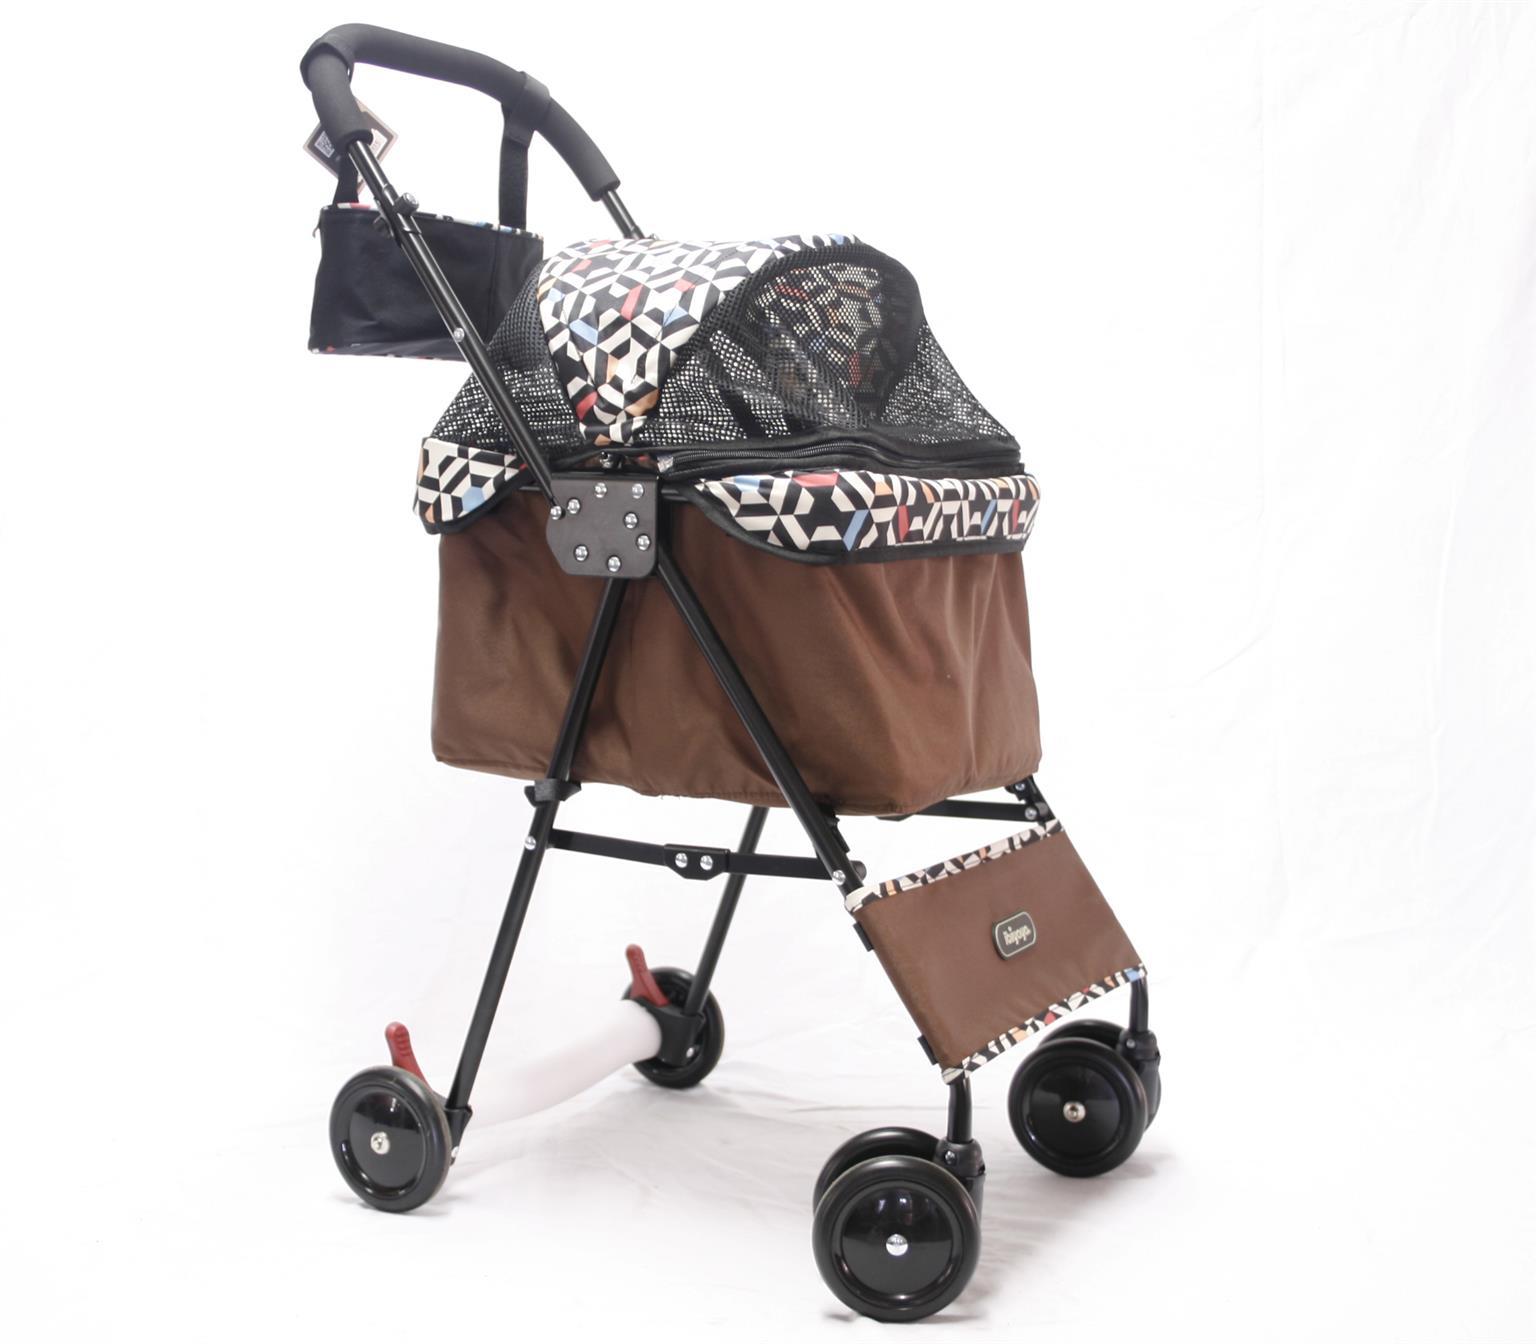 Dog Stroller Mini Buggy Honeycomb – 4 wheeler